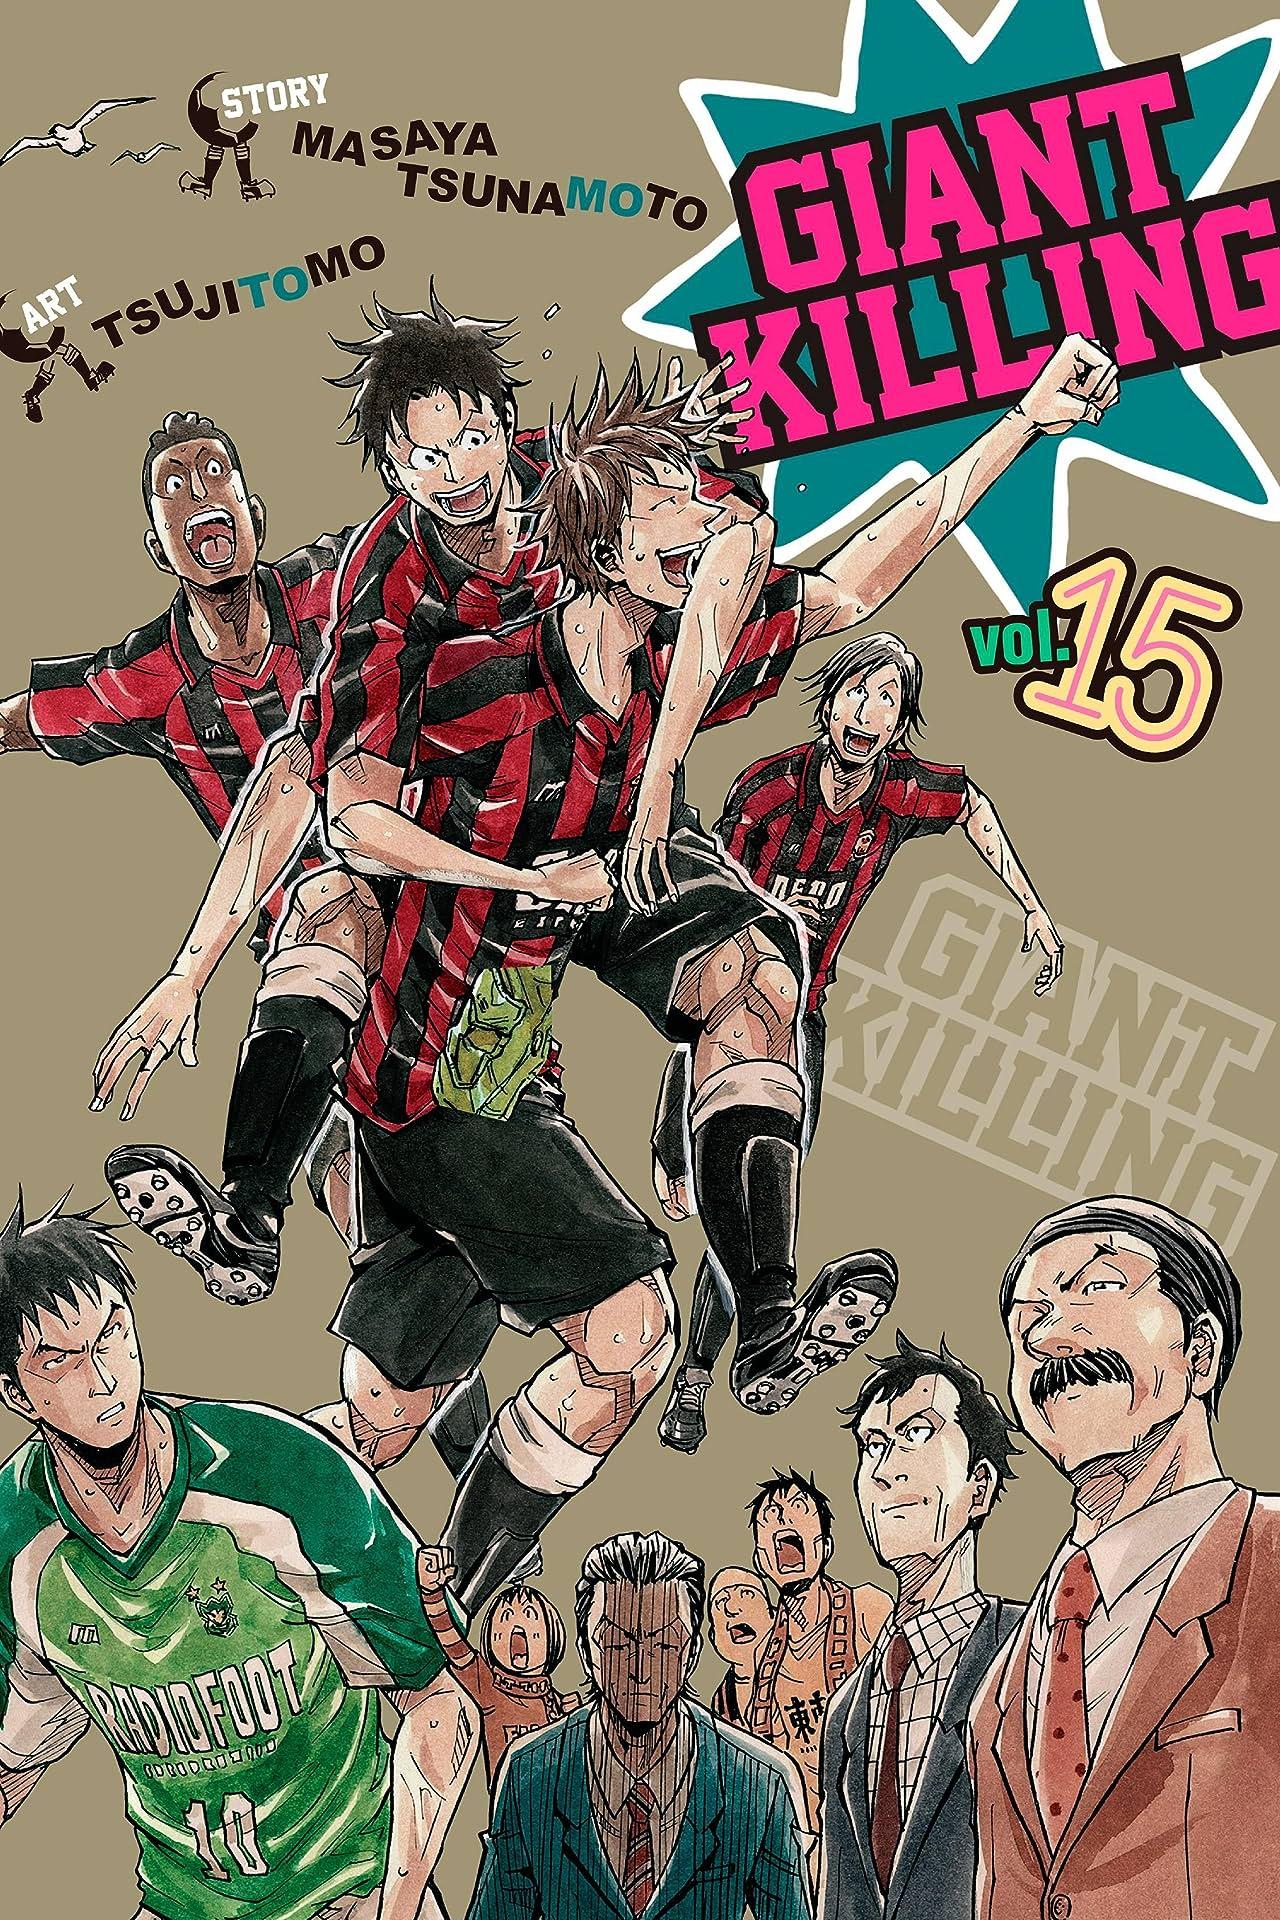 Giant Killing Vol. 15